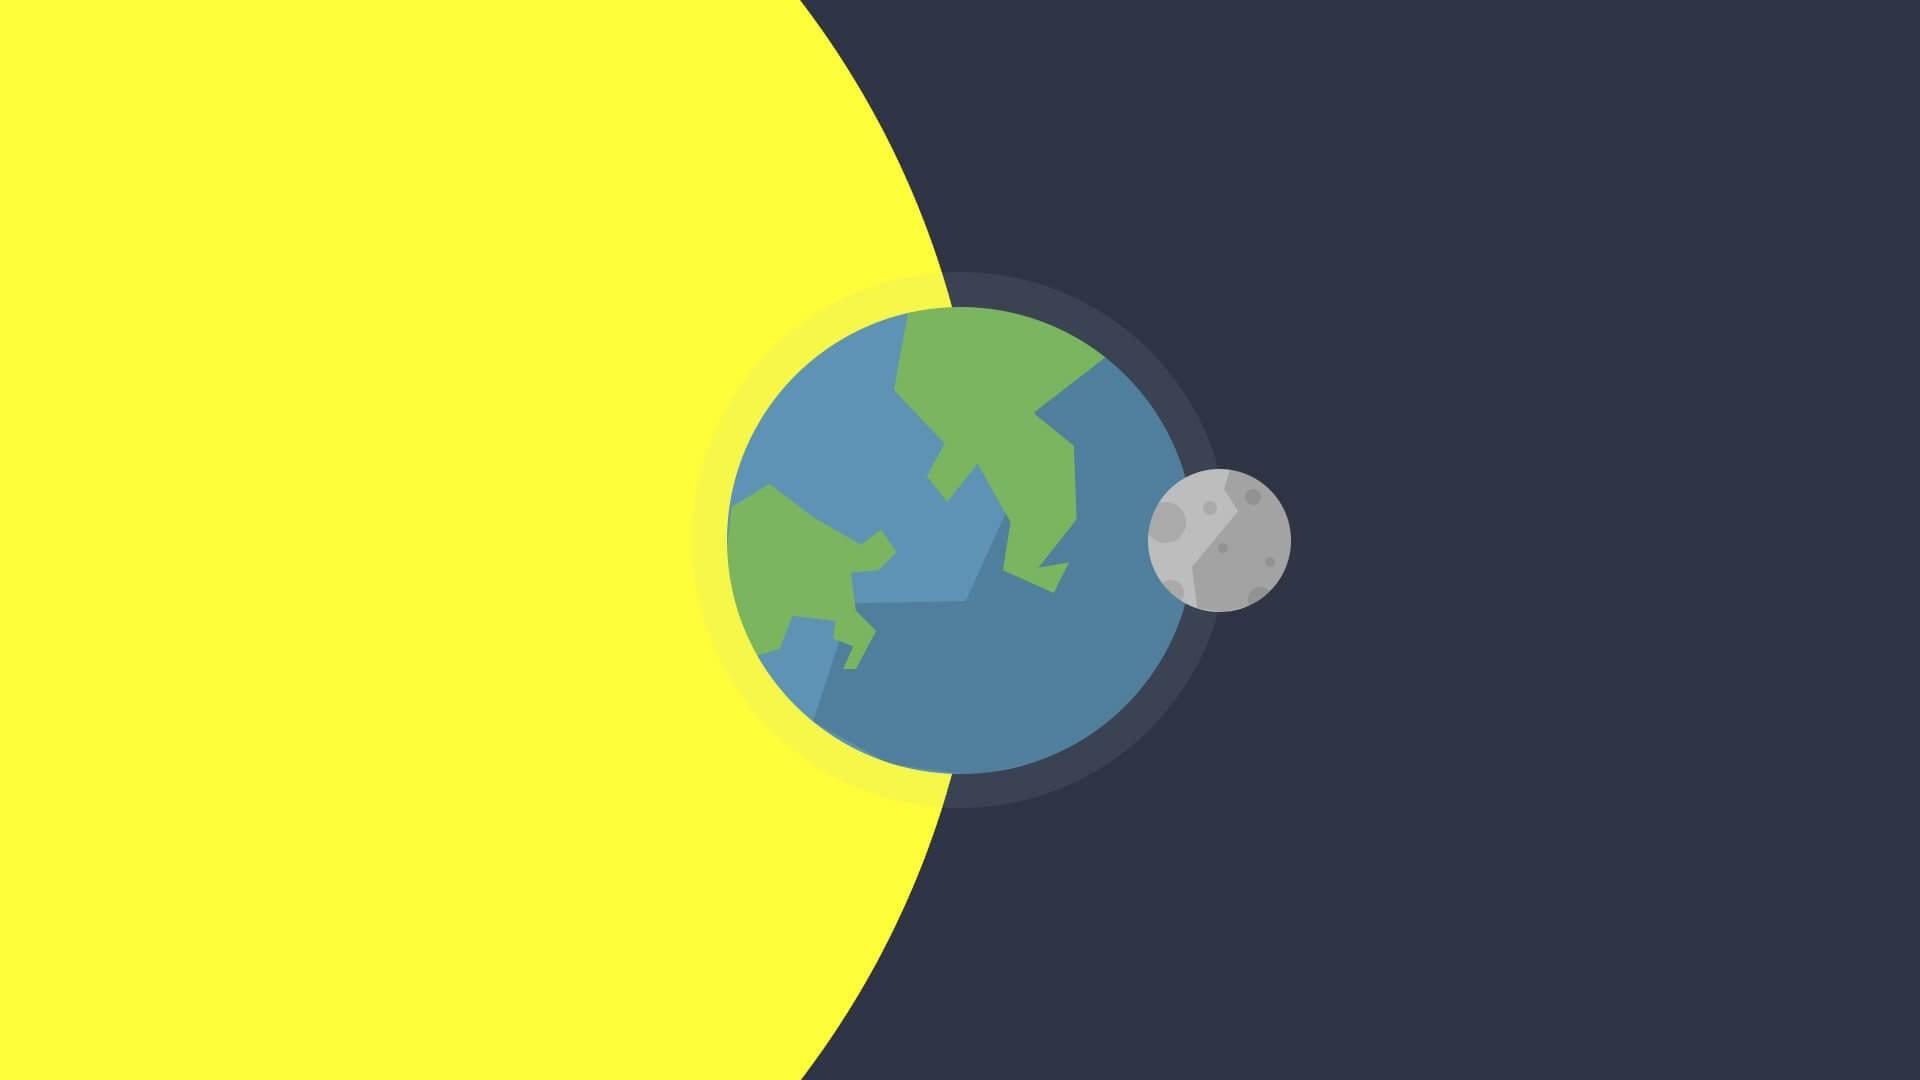 … Minimalistic-Wallpaper-09 snes space-earth …